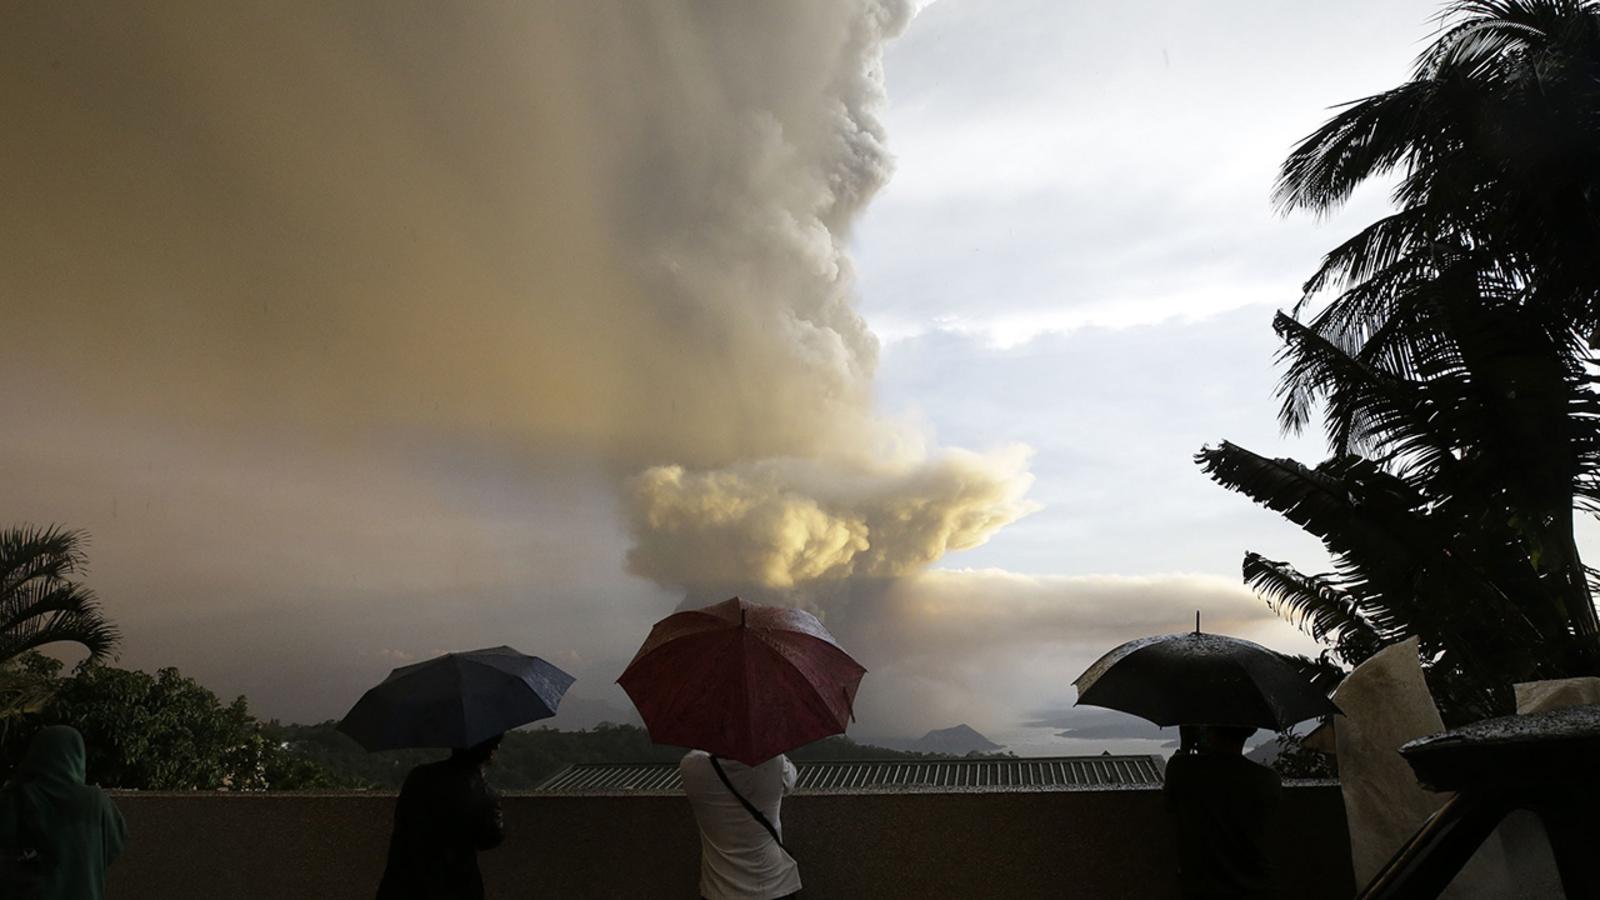 philippines:volcanonearmanilacoulderuptagainincomingdays:officials